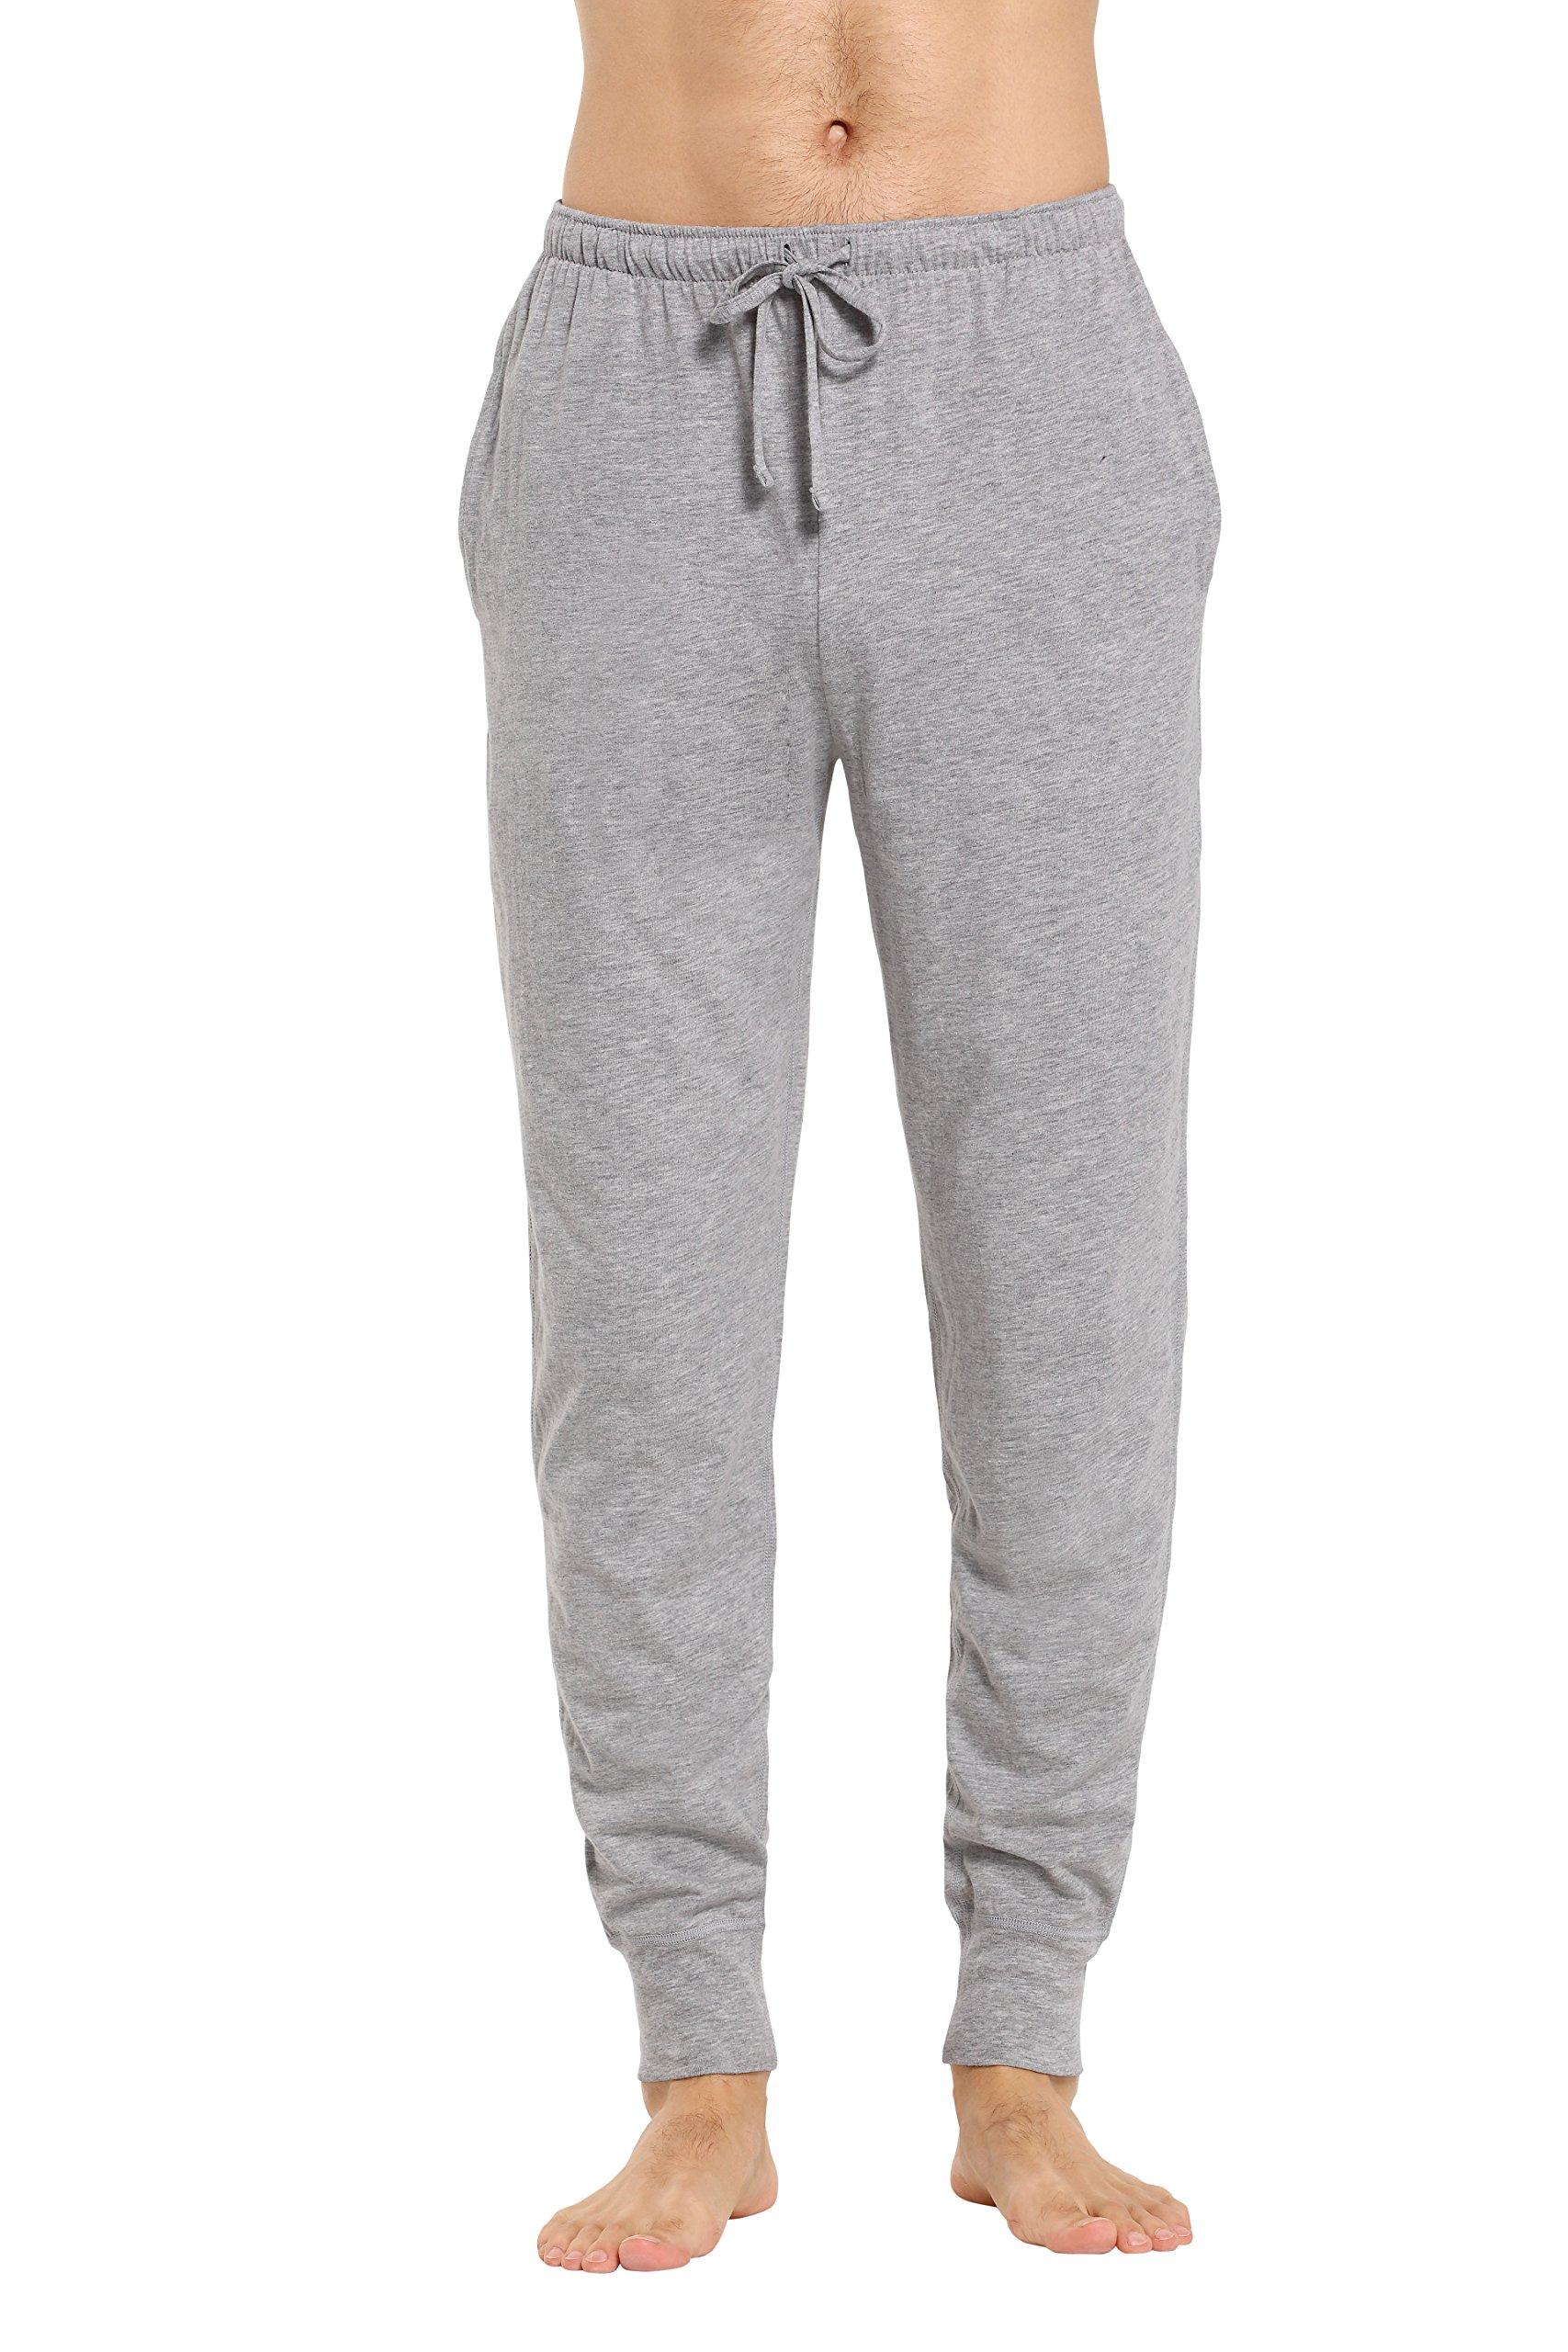 CYZ Men's Cotton Knit Lounge Pants with Drawstring-Grey Melange-S